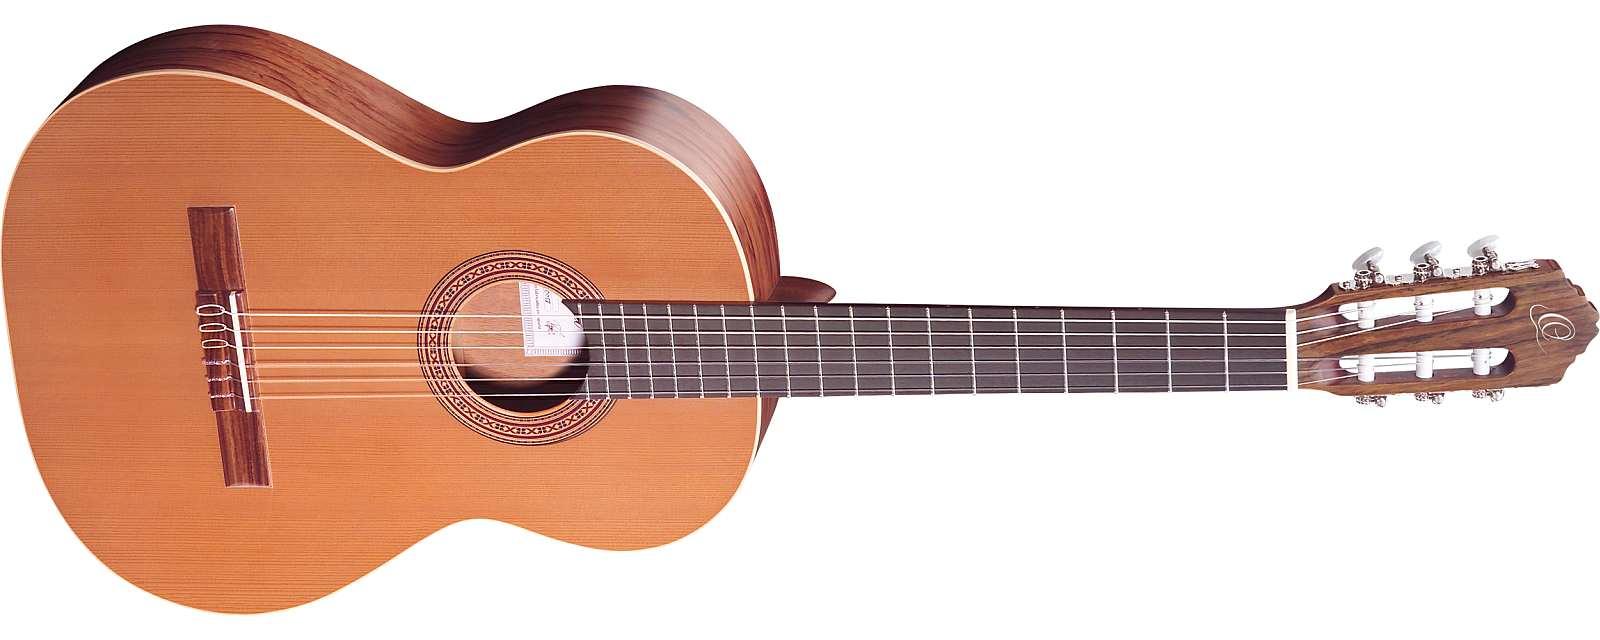 Ortega R-180 Konzertgitarre